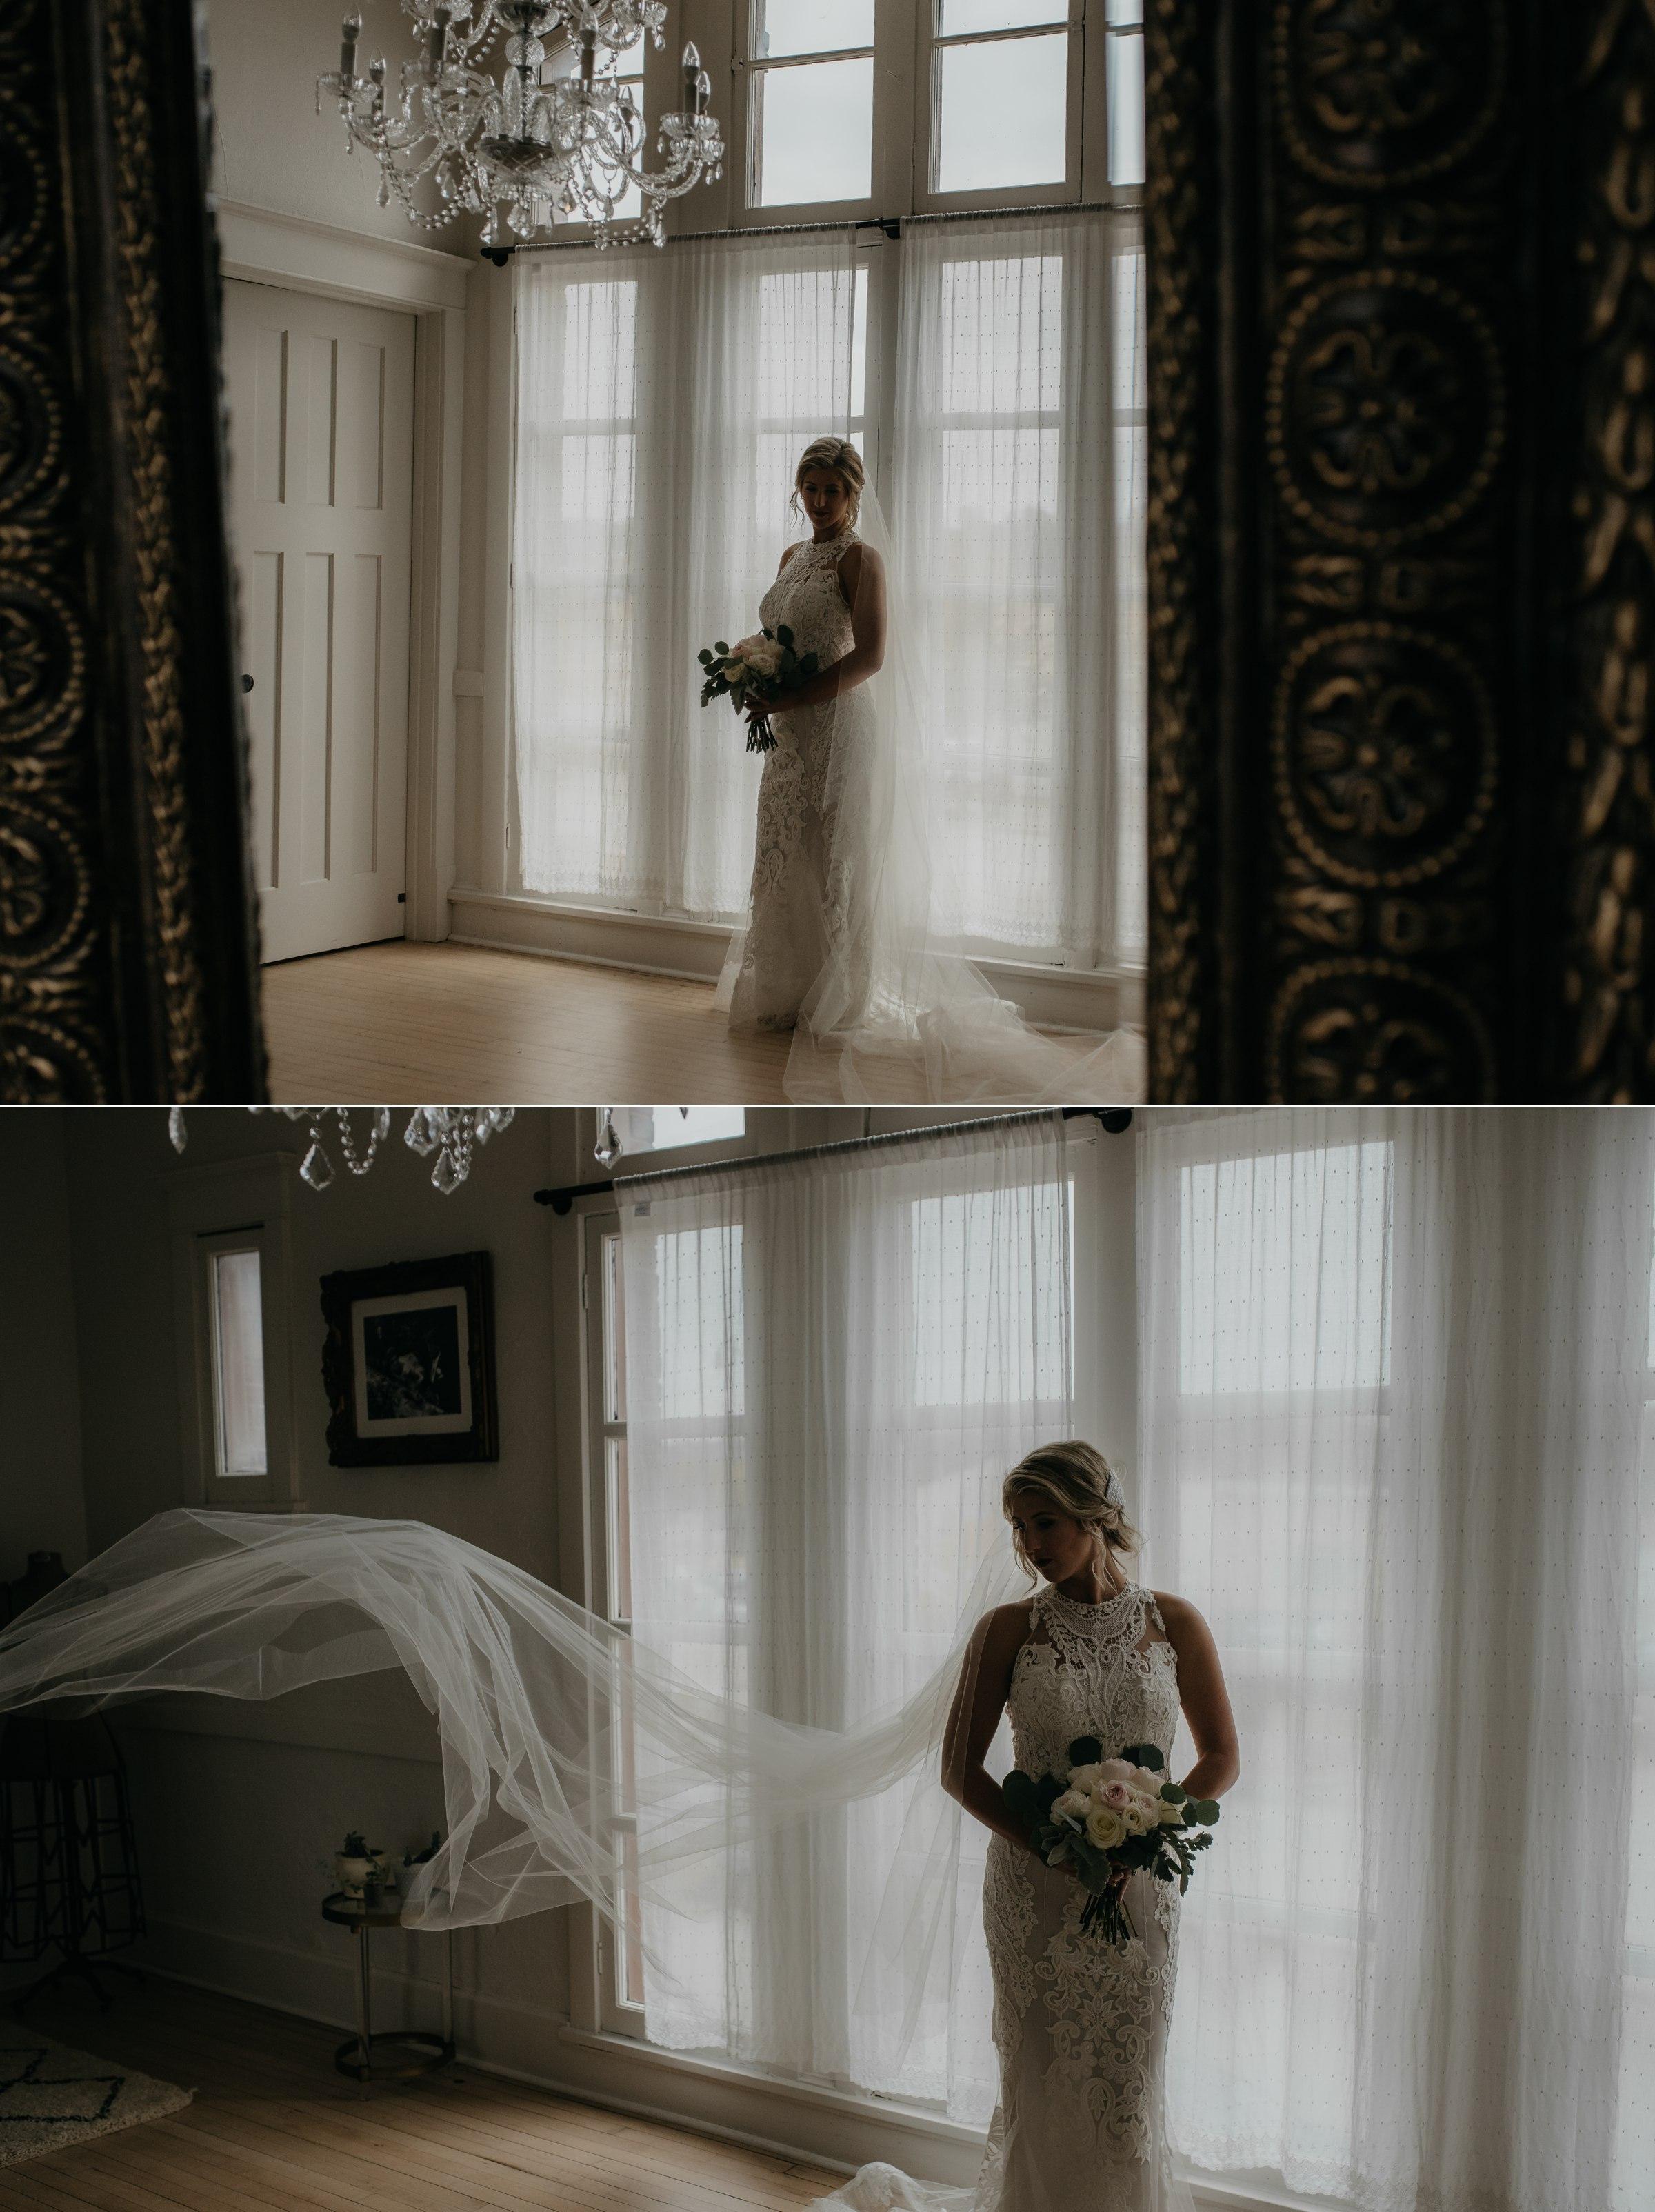 elopement-photographer-austin-best-wedding-minneapolis-adventurous-wedding-modern-morocco-new york-new orleans-mexica-costa rica-italy-affordable-best_0049.jpg